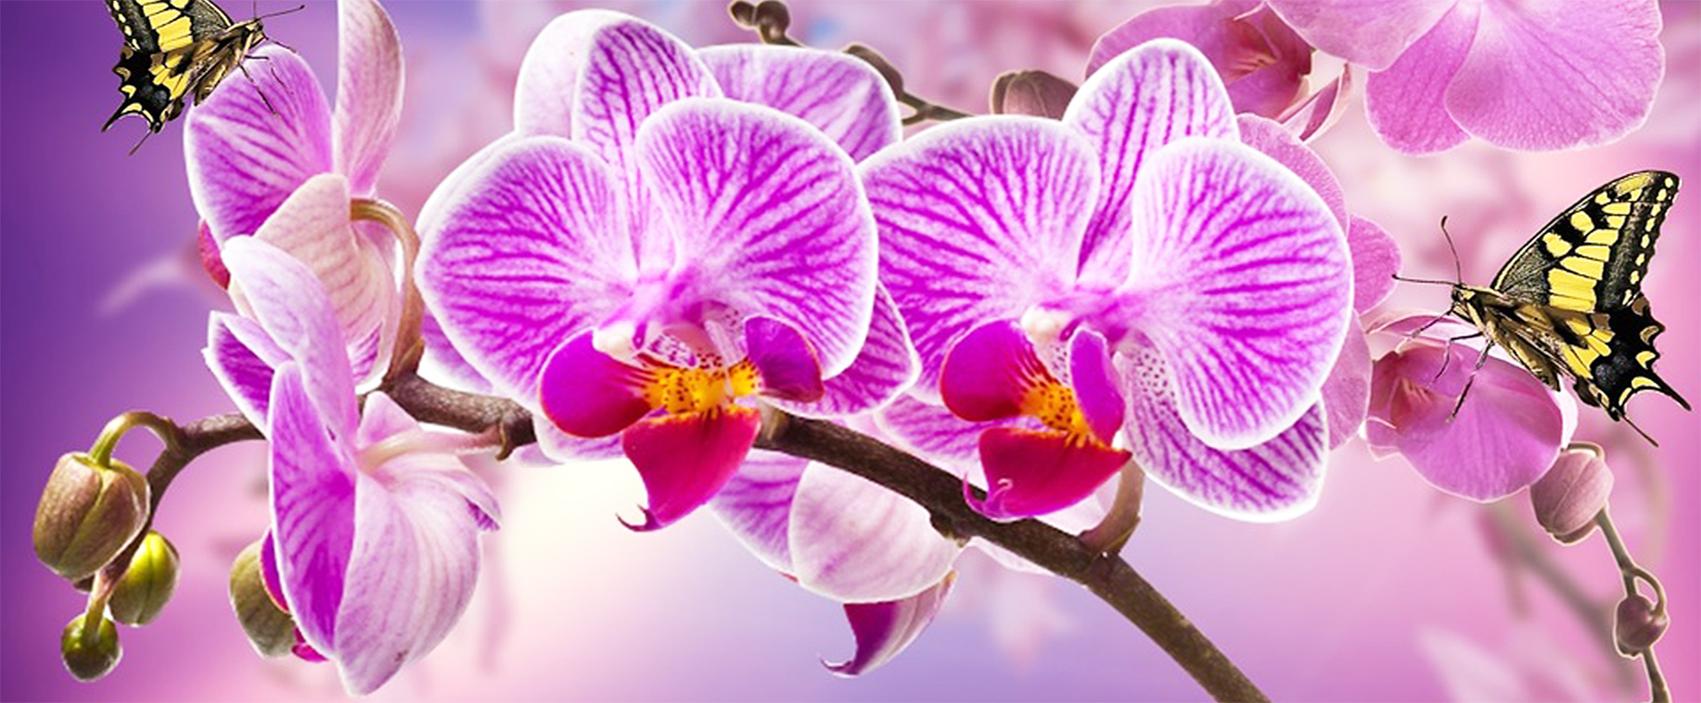 orchidee orchidea